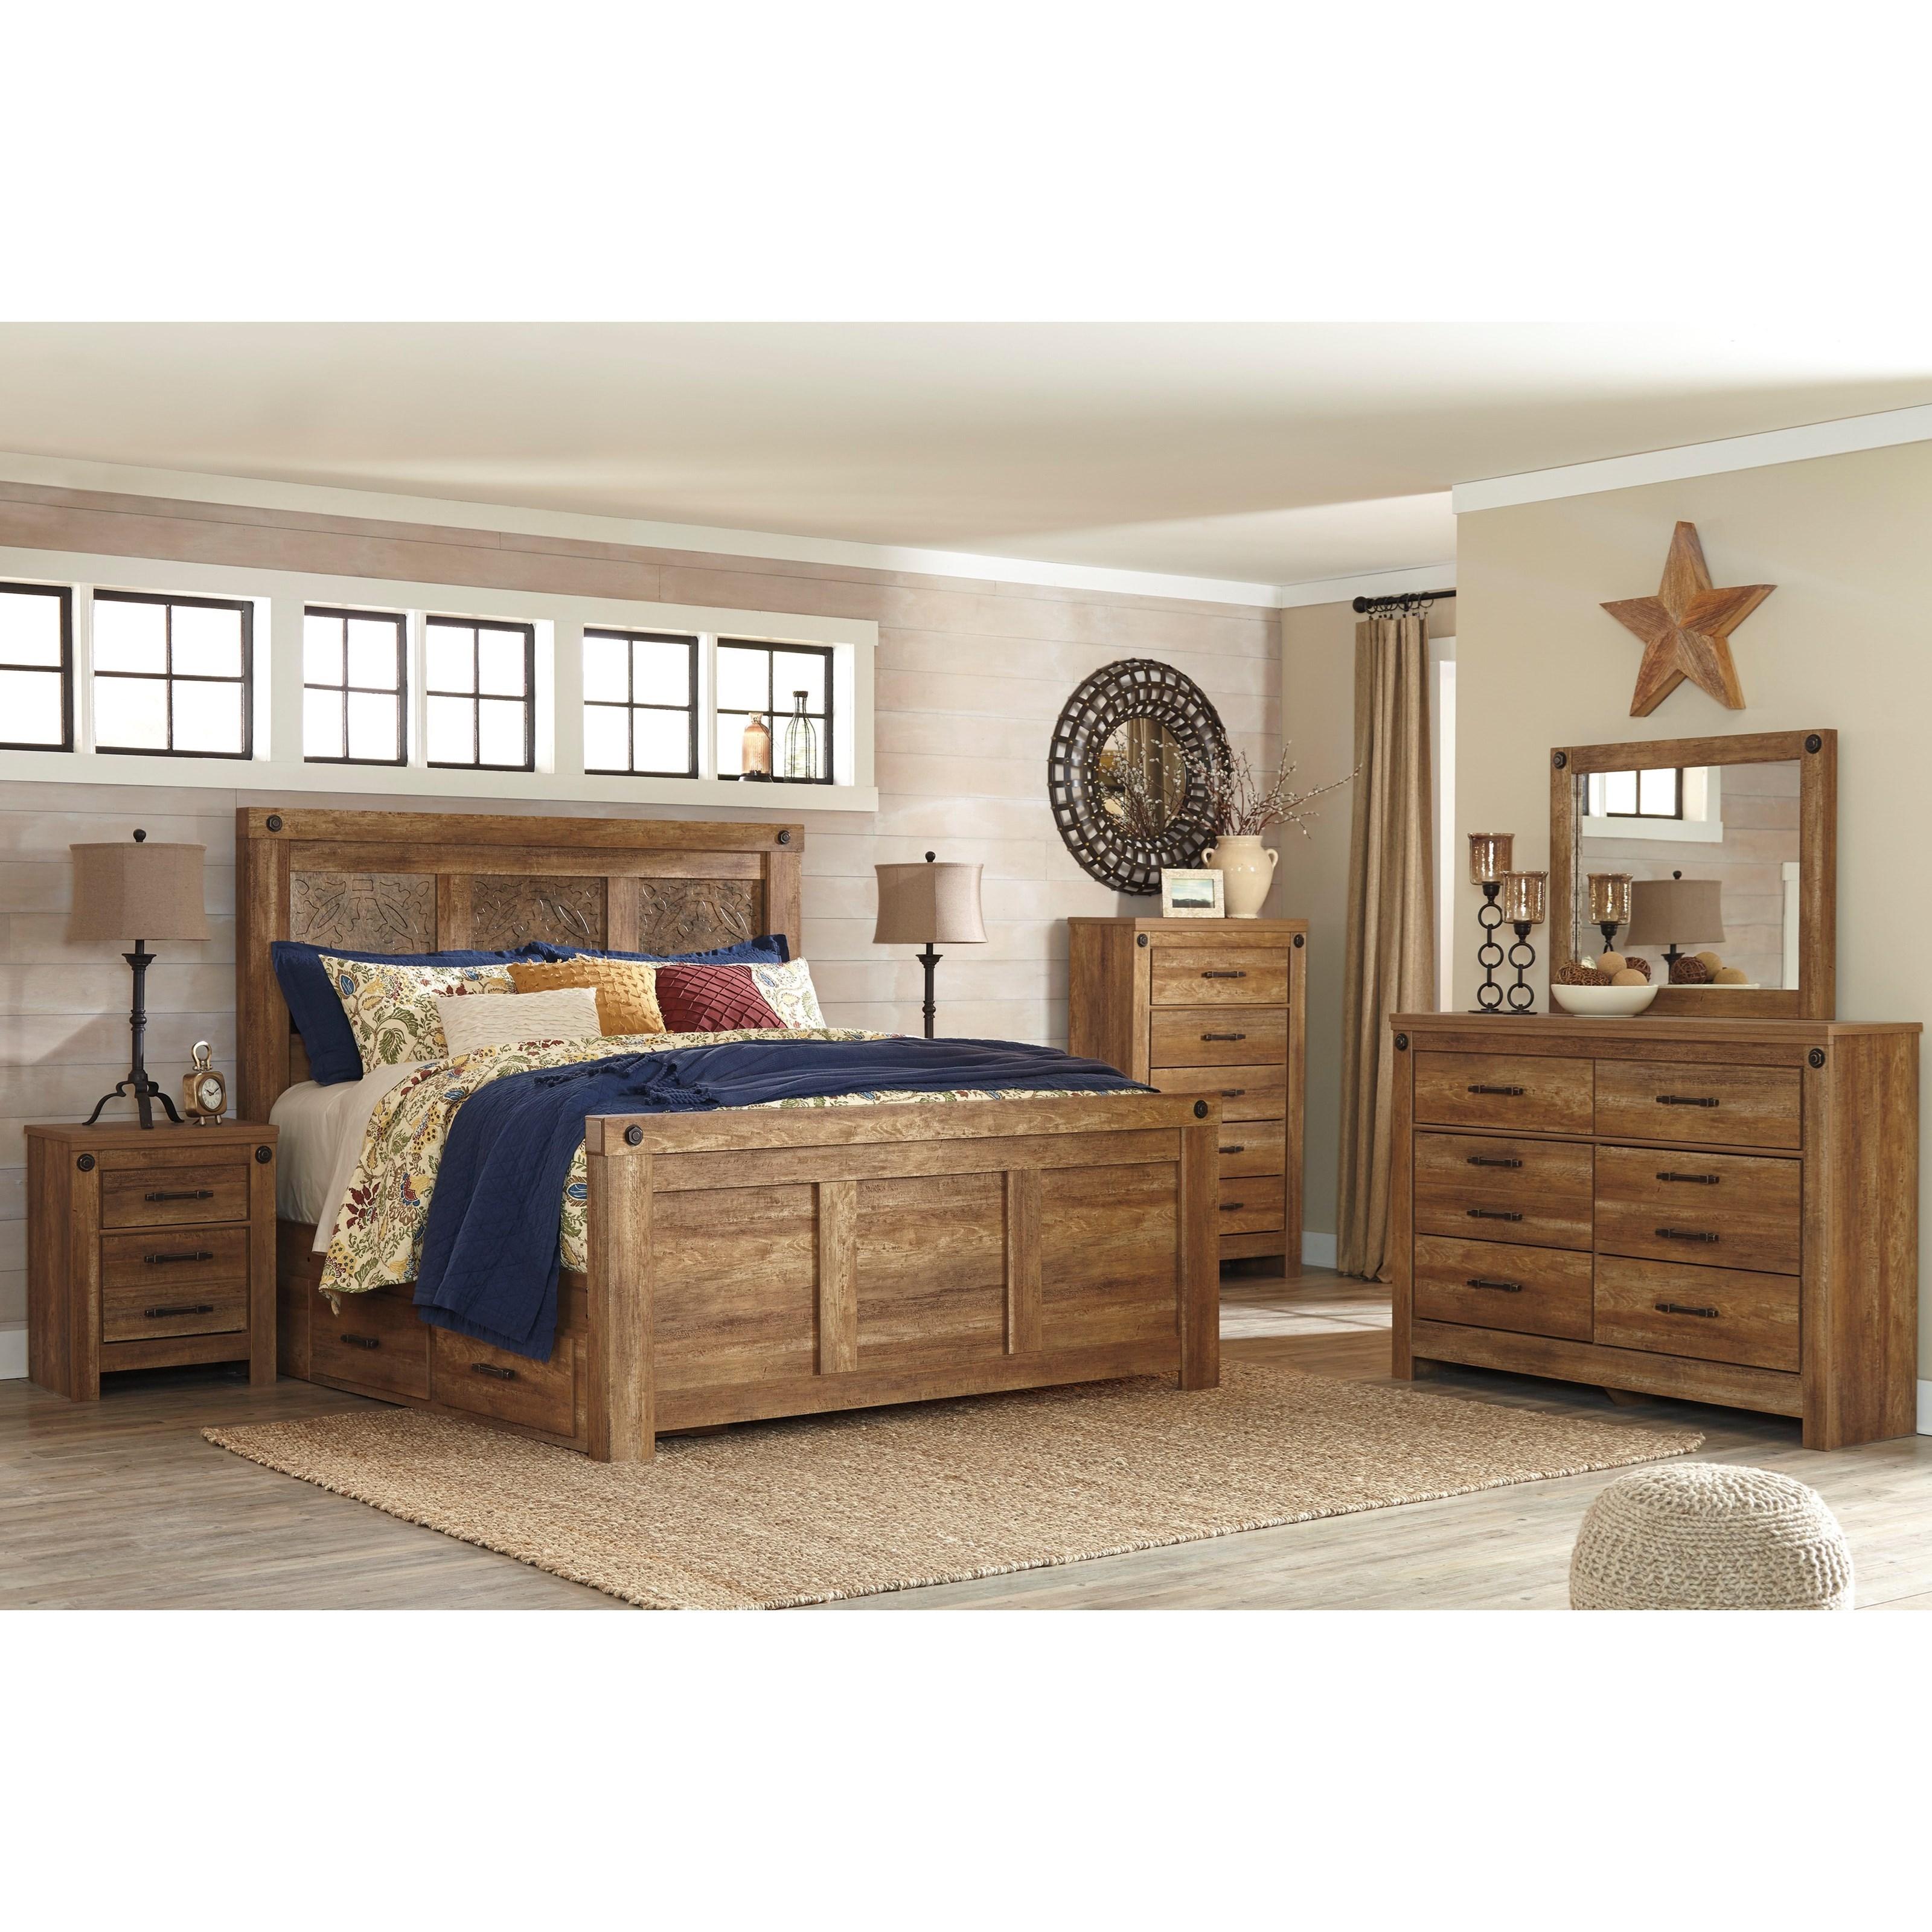 Signature Design by Ashley Ladimier King Bedroom Group - Item Number: B399 K Bedroom Group 2